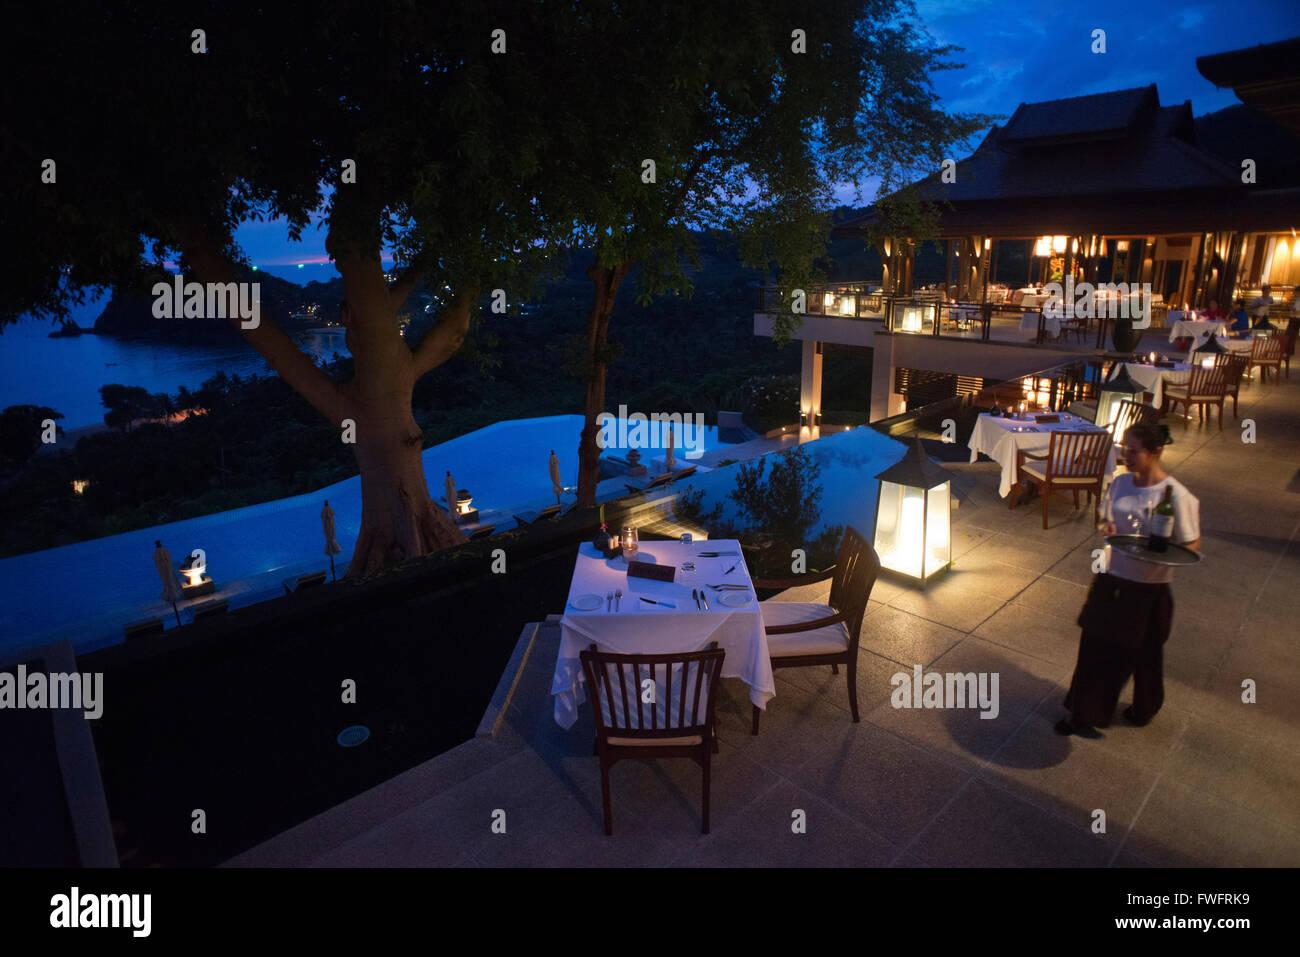 Sunset. Restaurant in fornt of the pool at the luxury hotel Pimalai Resort, Kantiang Beach, Ko Lanta or Koh Lanta - Stock Image